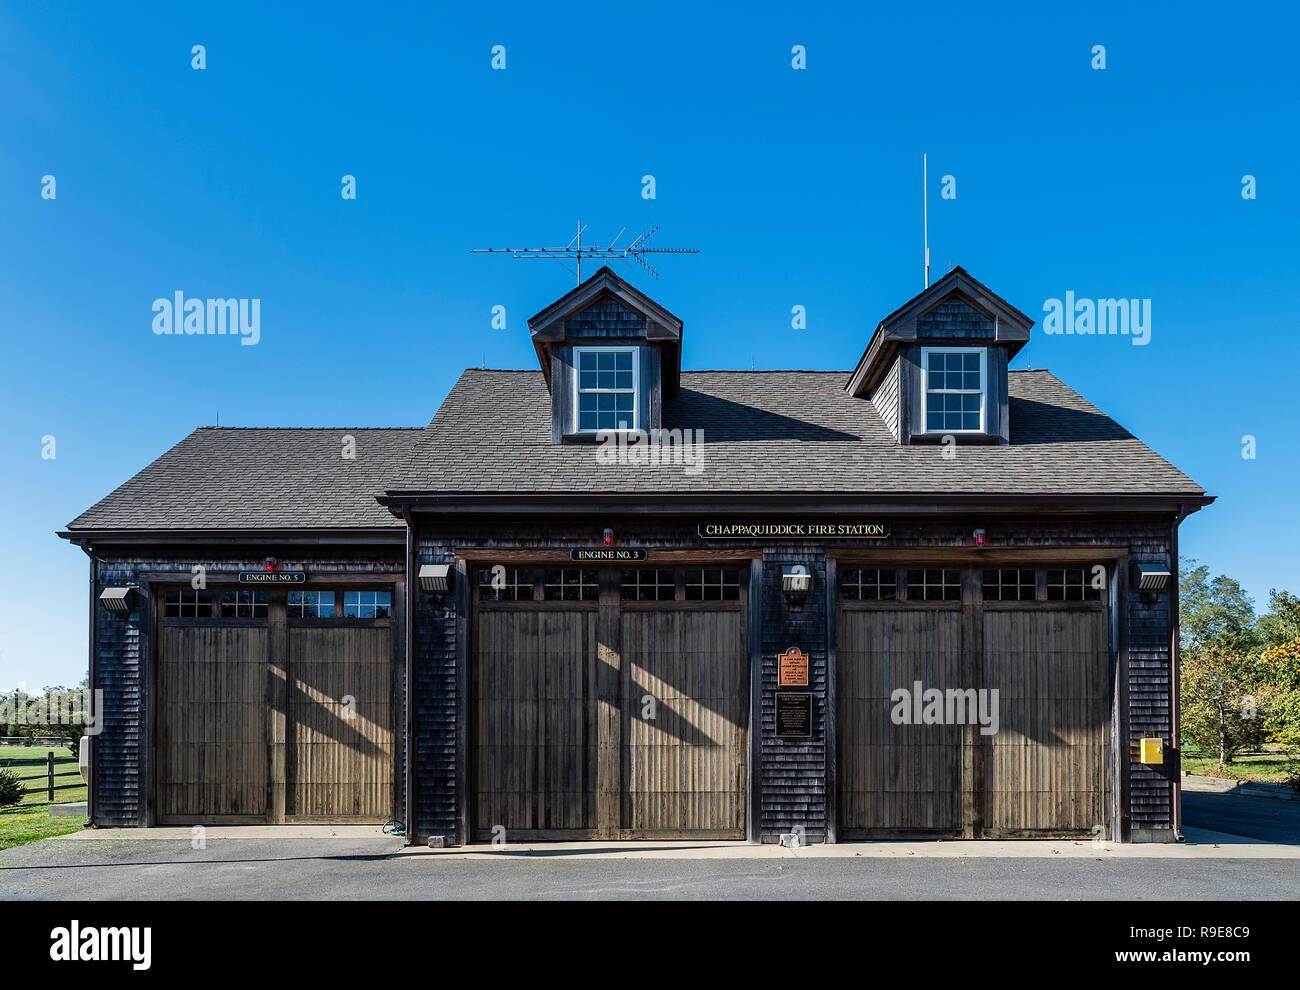 Charming Cappaquiddick Fire Station, Edgartown, Martha's Vineyard, Massachusetts, USA. - Stock Image